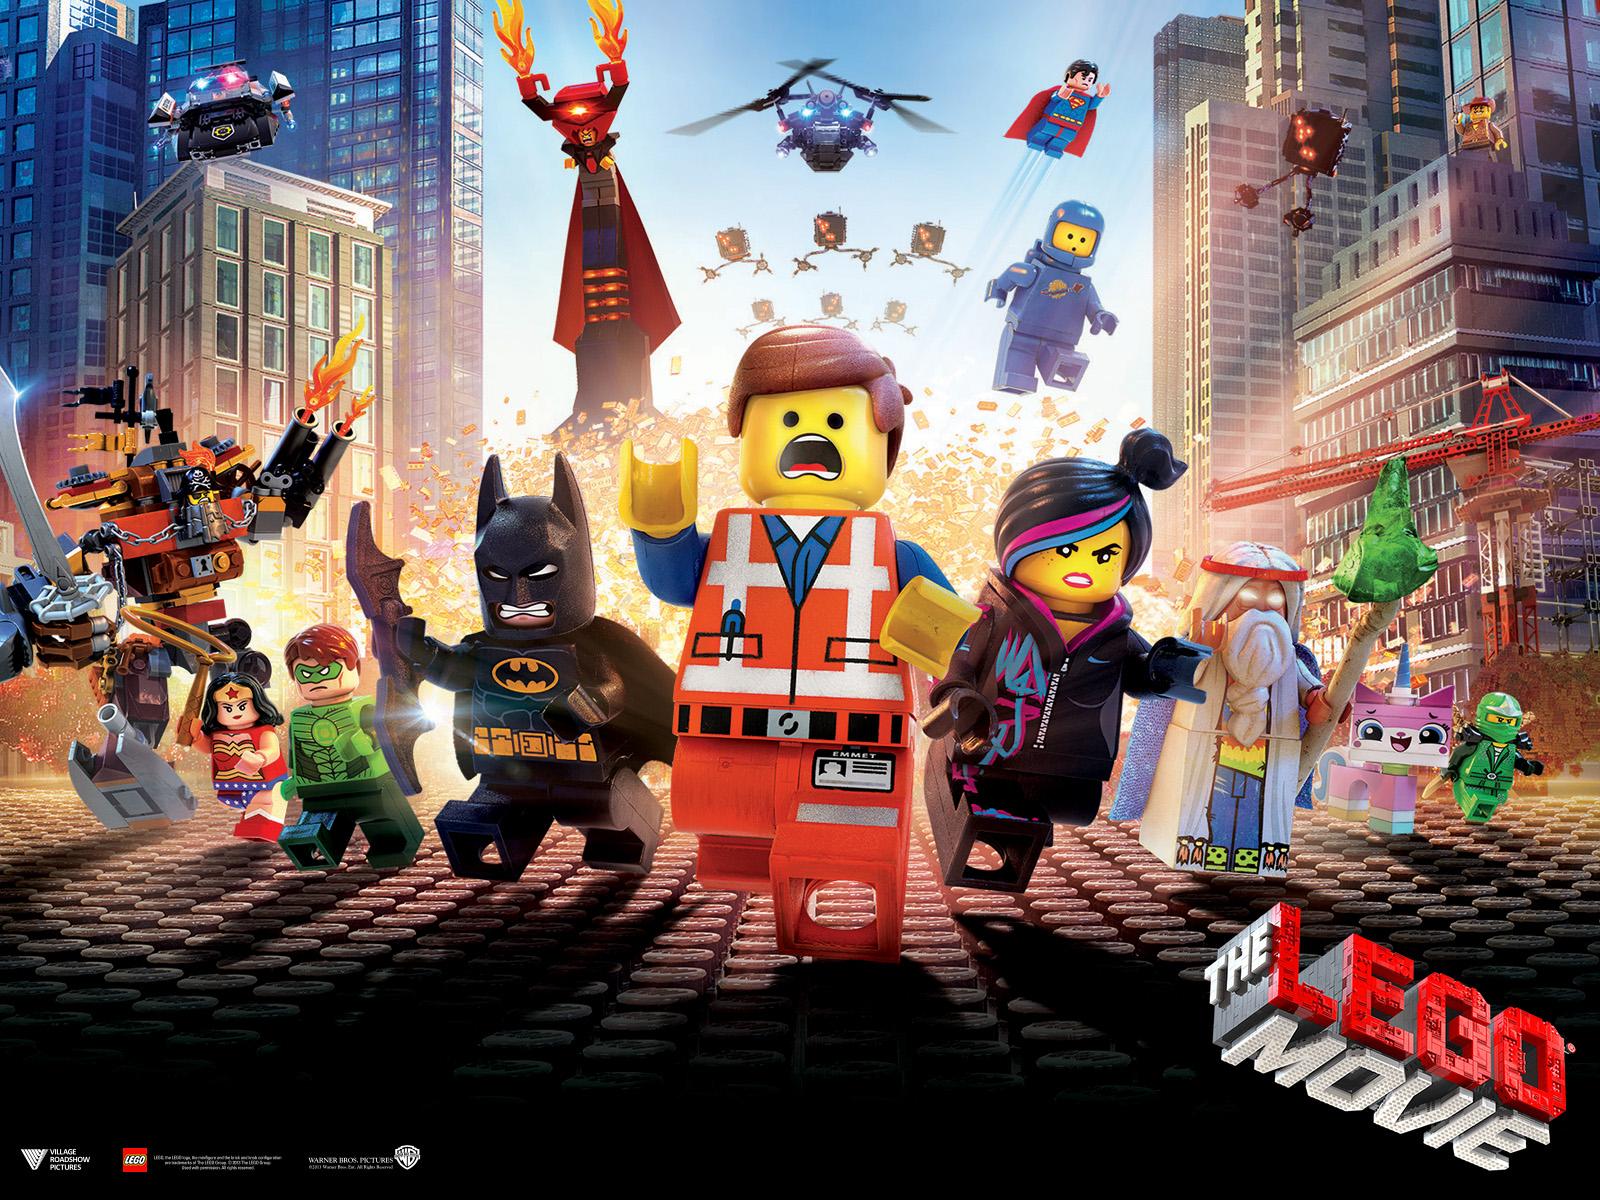 Lego_WPS_1600_1sheet